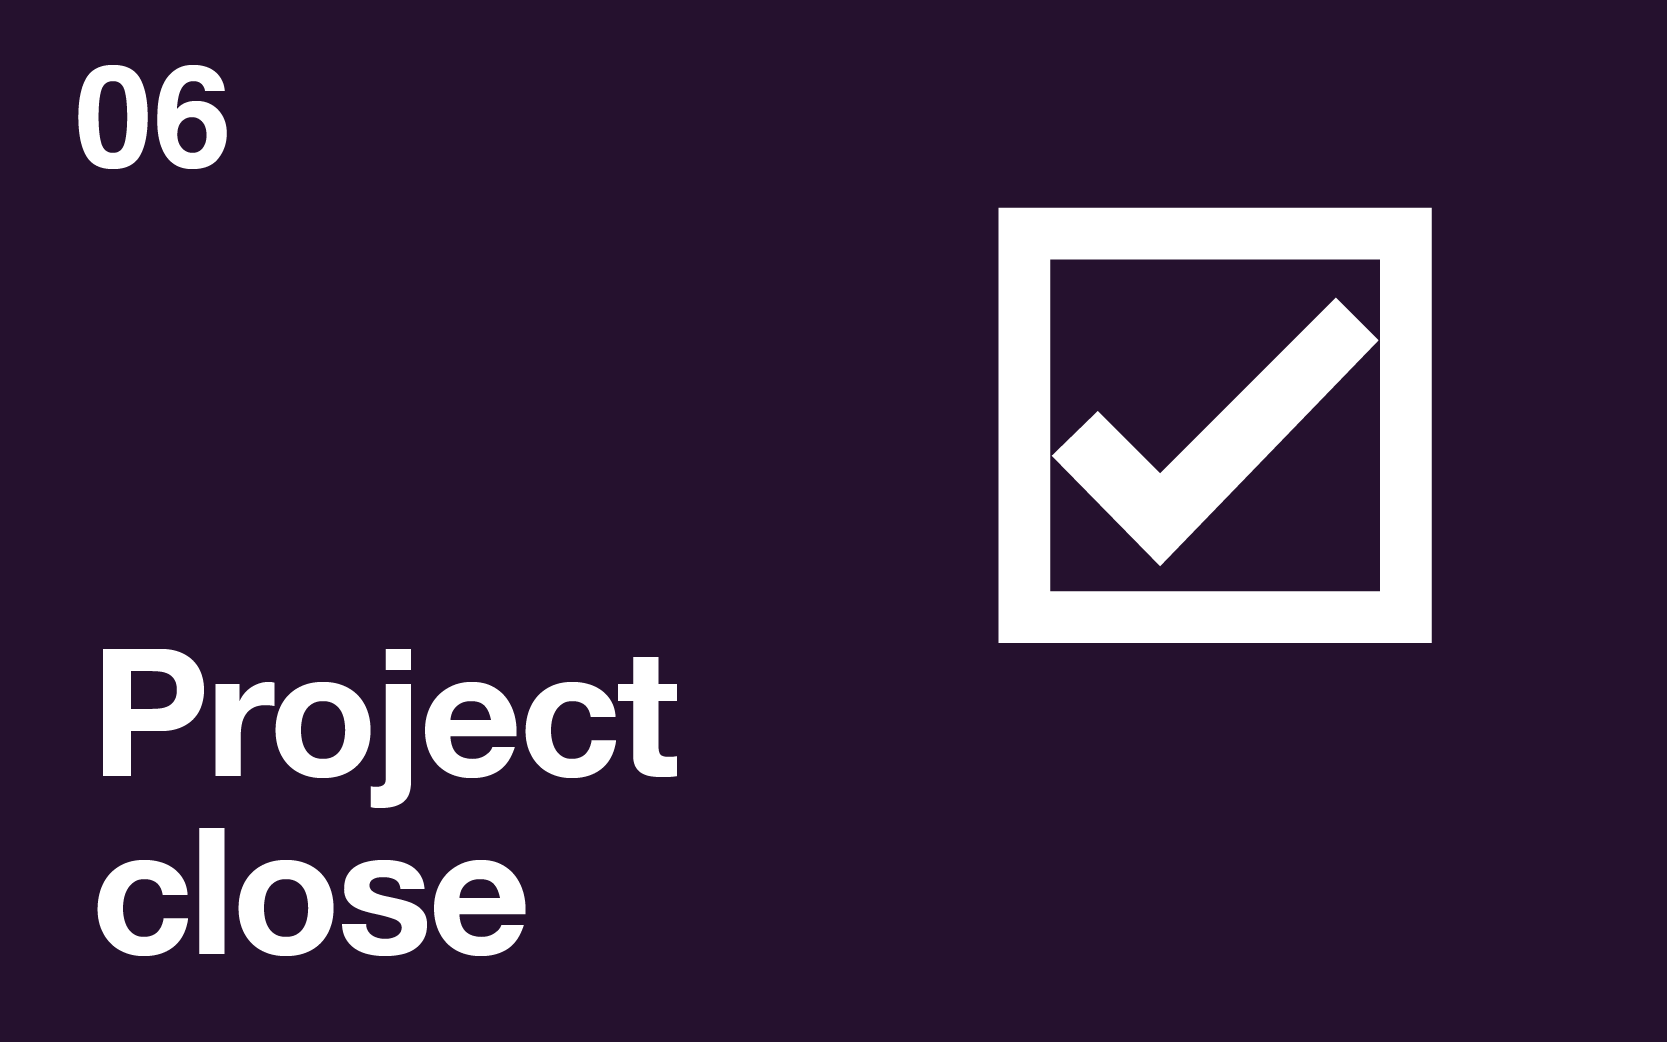 06-project-close-teaser